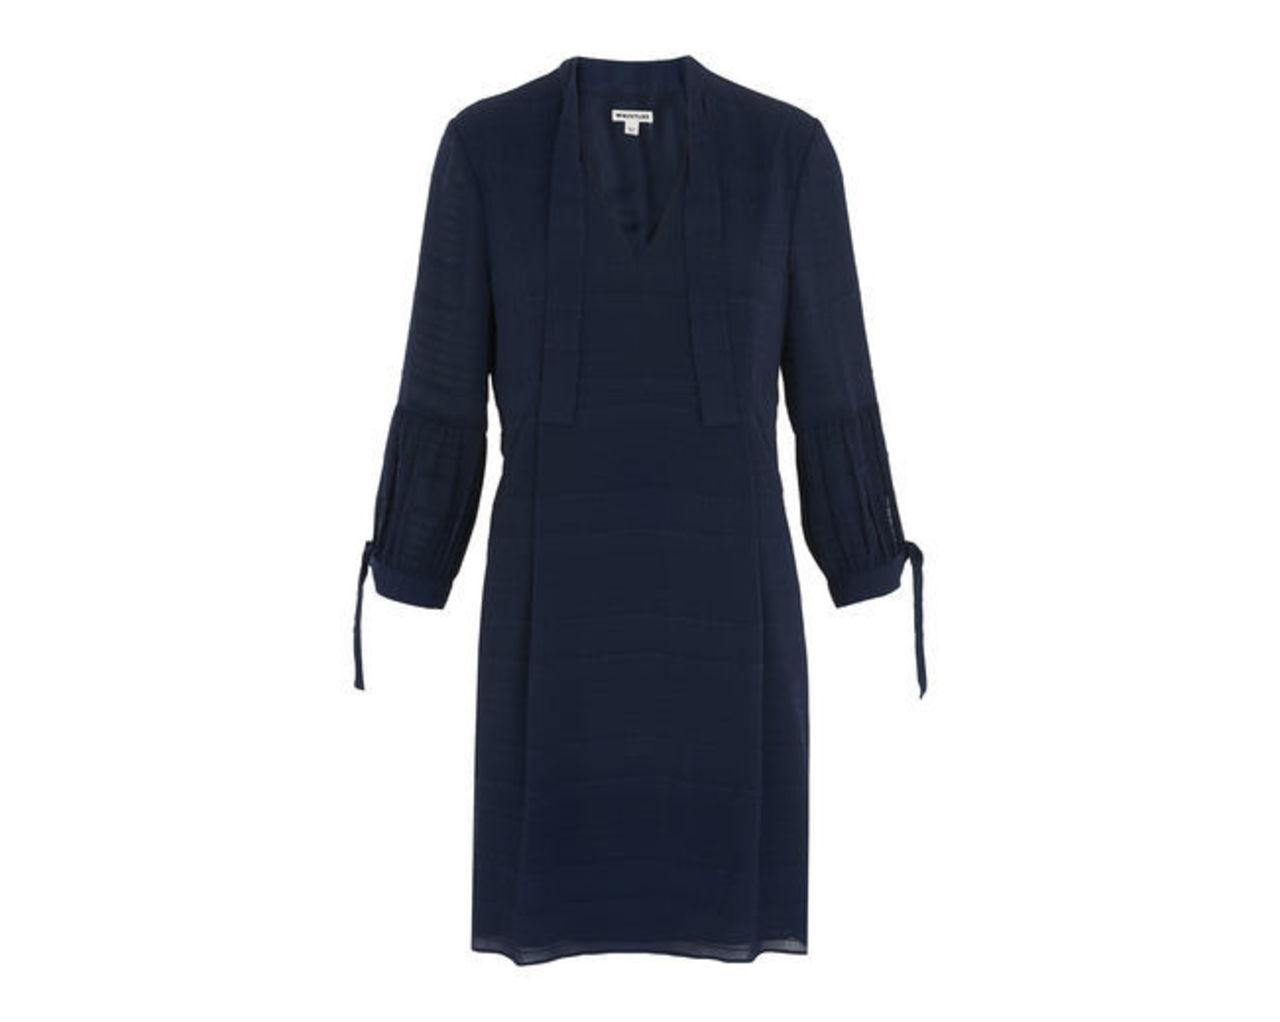 Joanna Tie Sleeve Dress